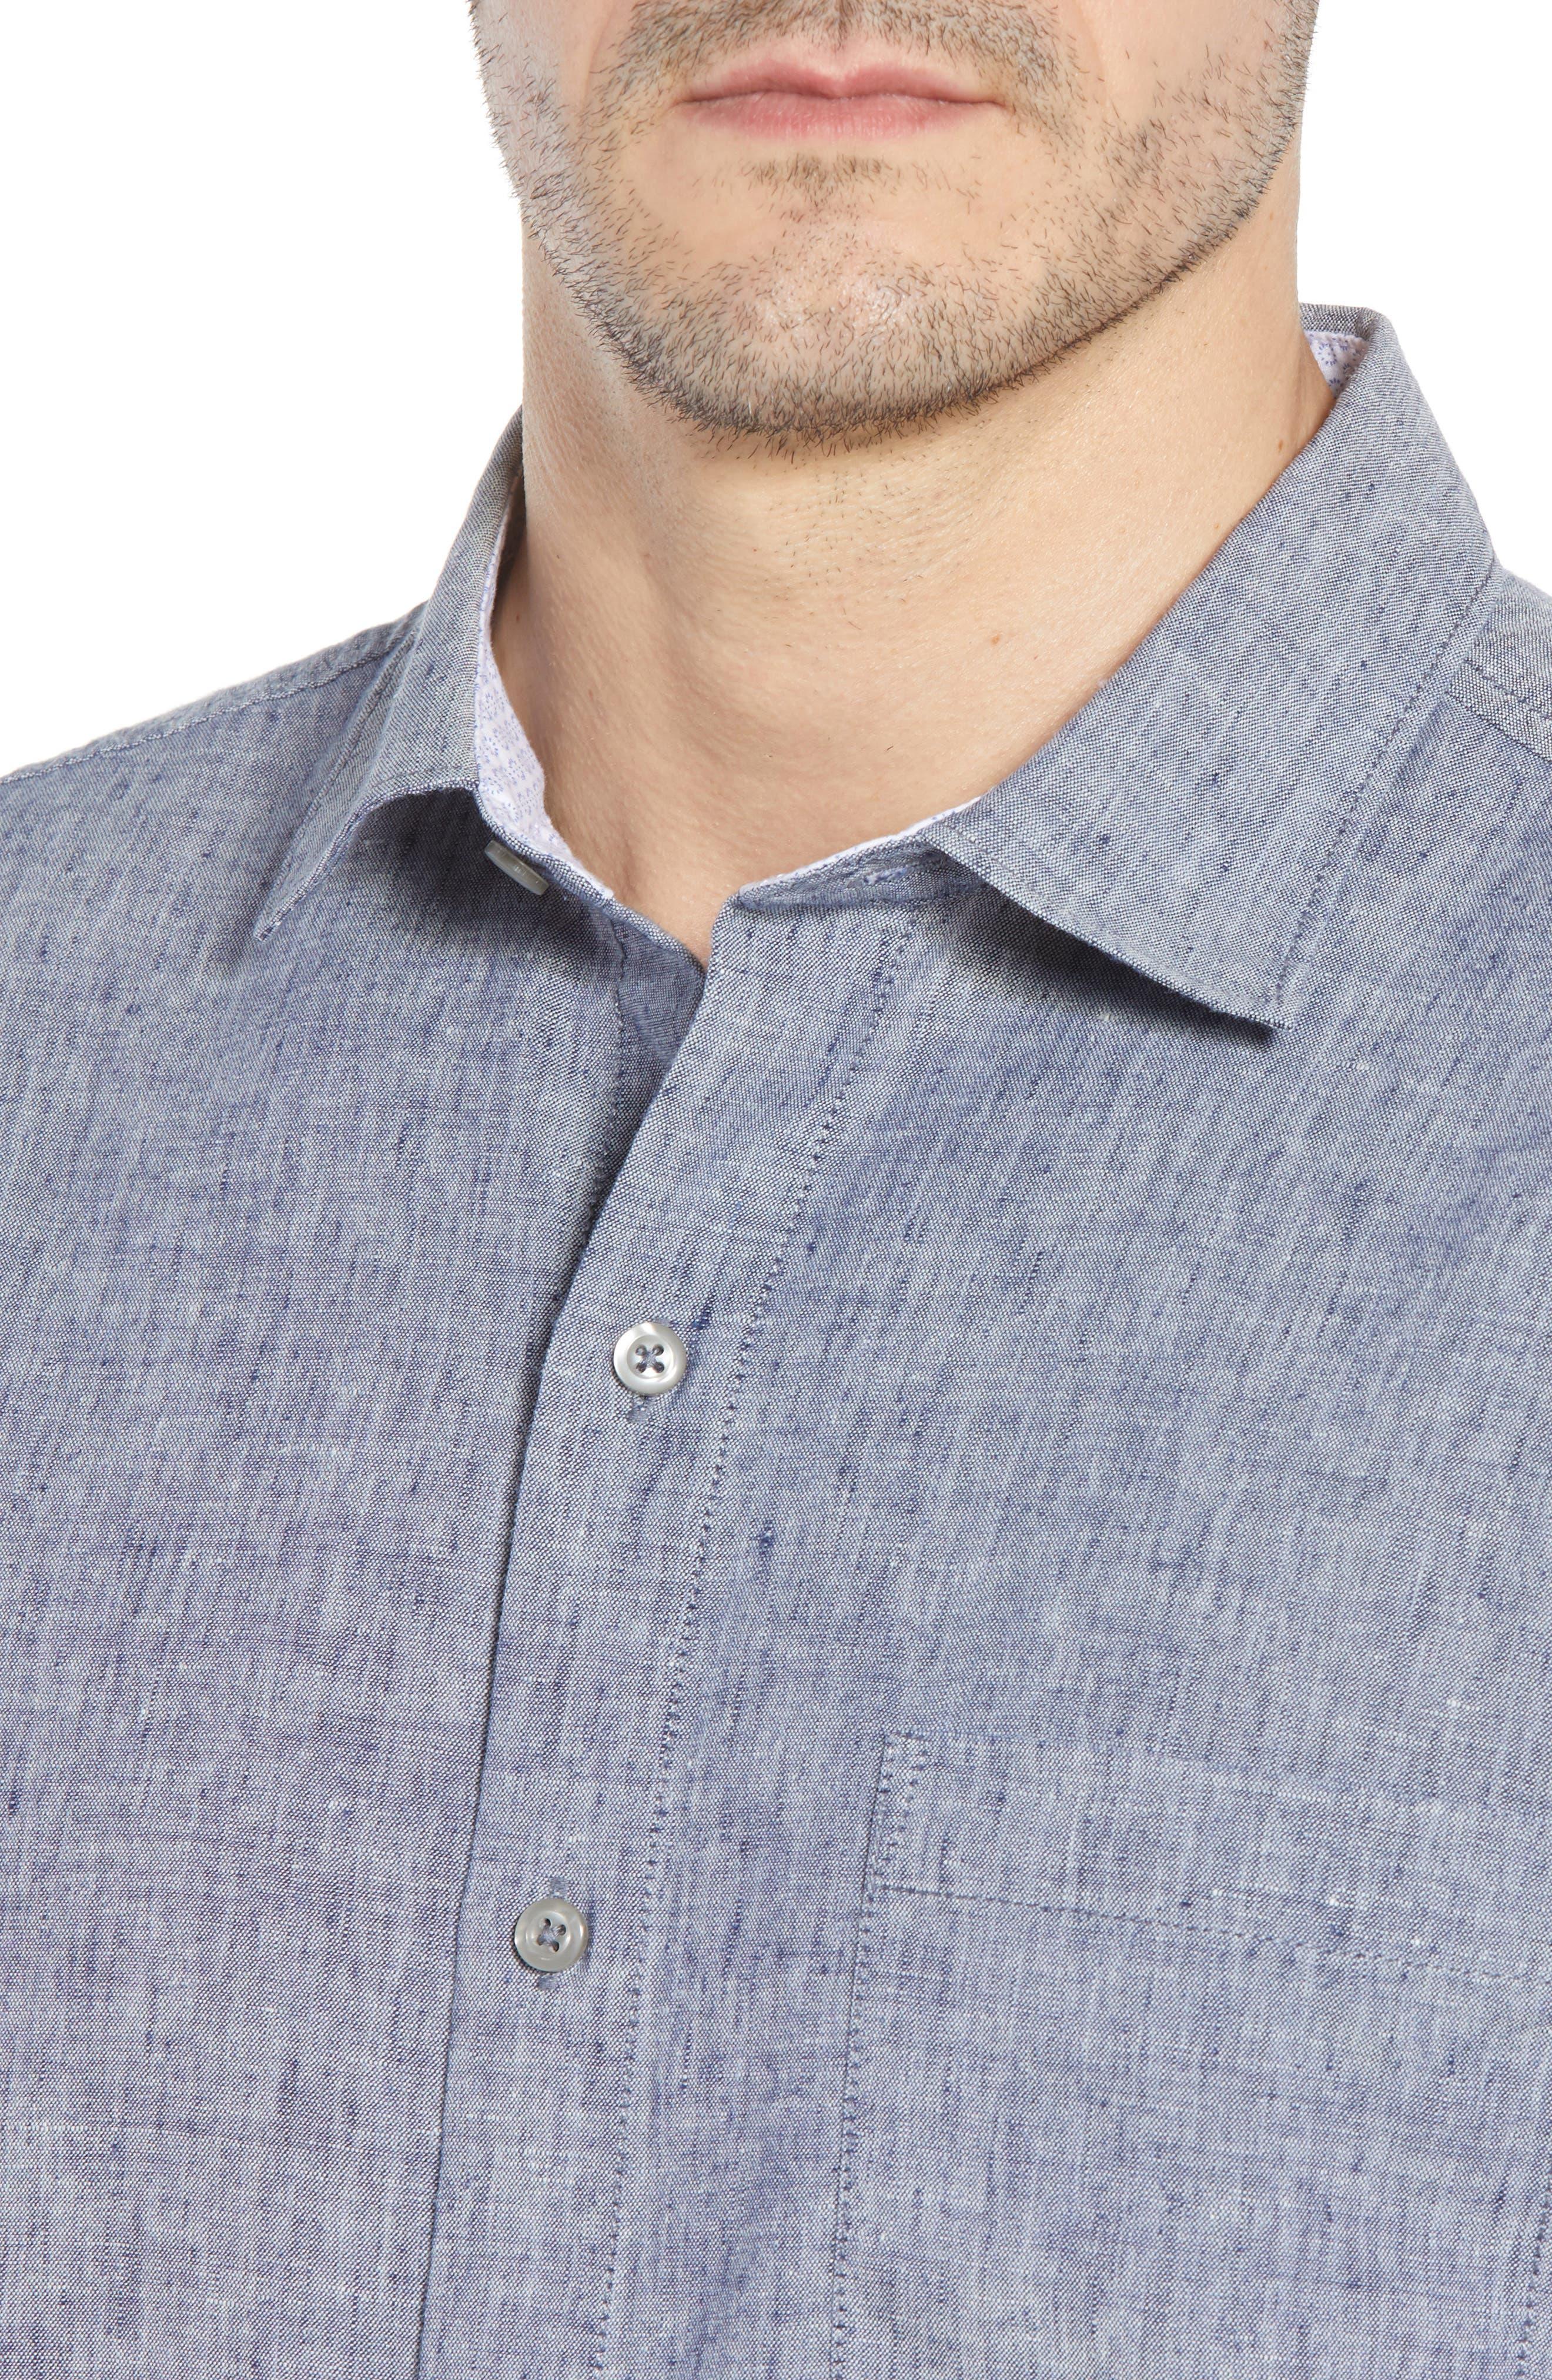 Lanai Tides Linen Blend Sport Shirt,                             Alternate thumbnail 4, color,                             THRONE BLUE